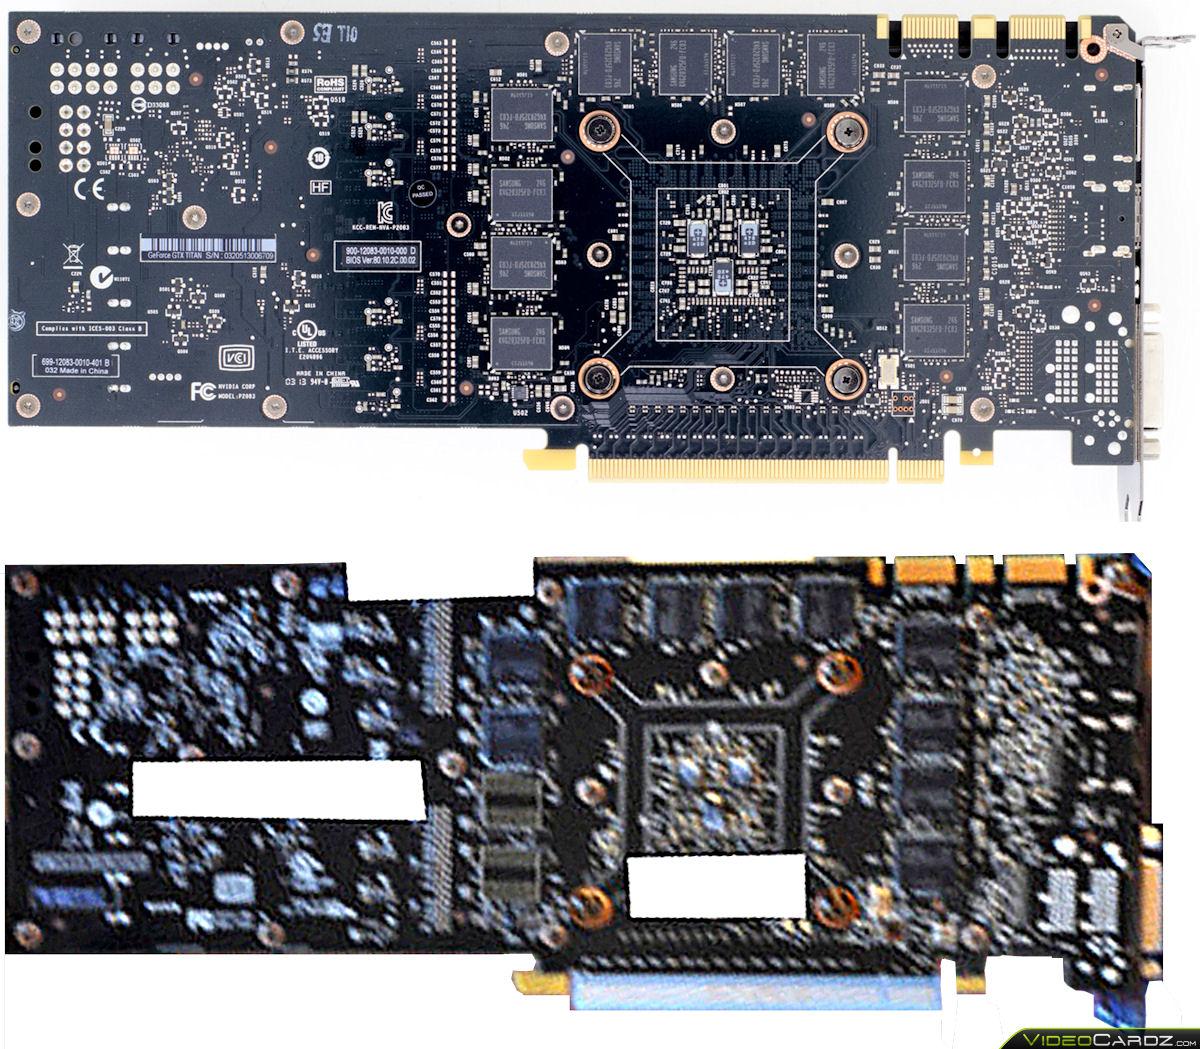 Nvidia Geforce Gtx Titan Le Pcb Pictured Videocardz Com